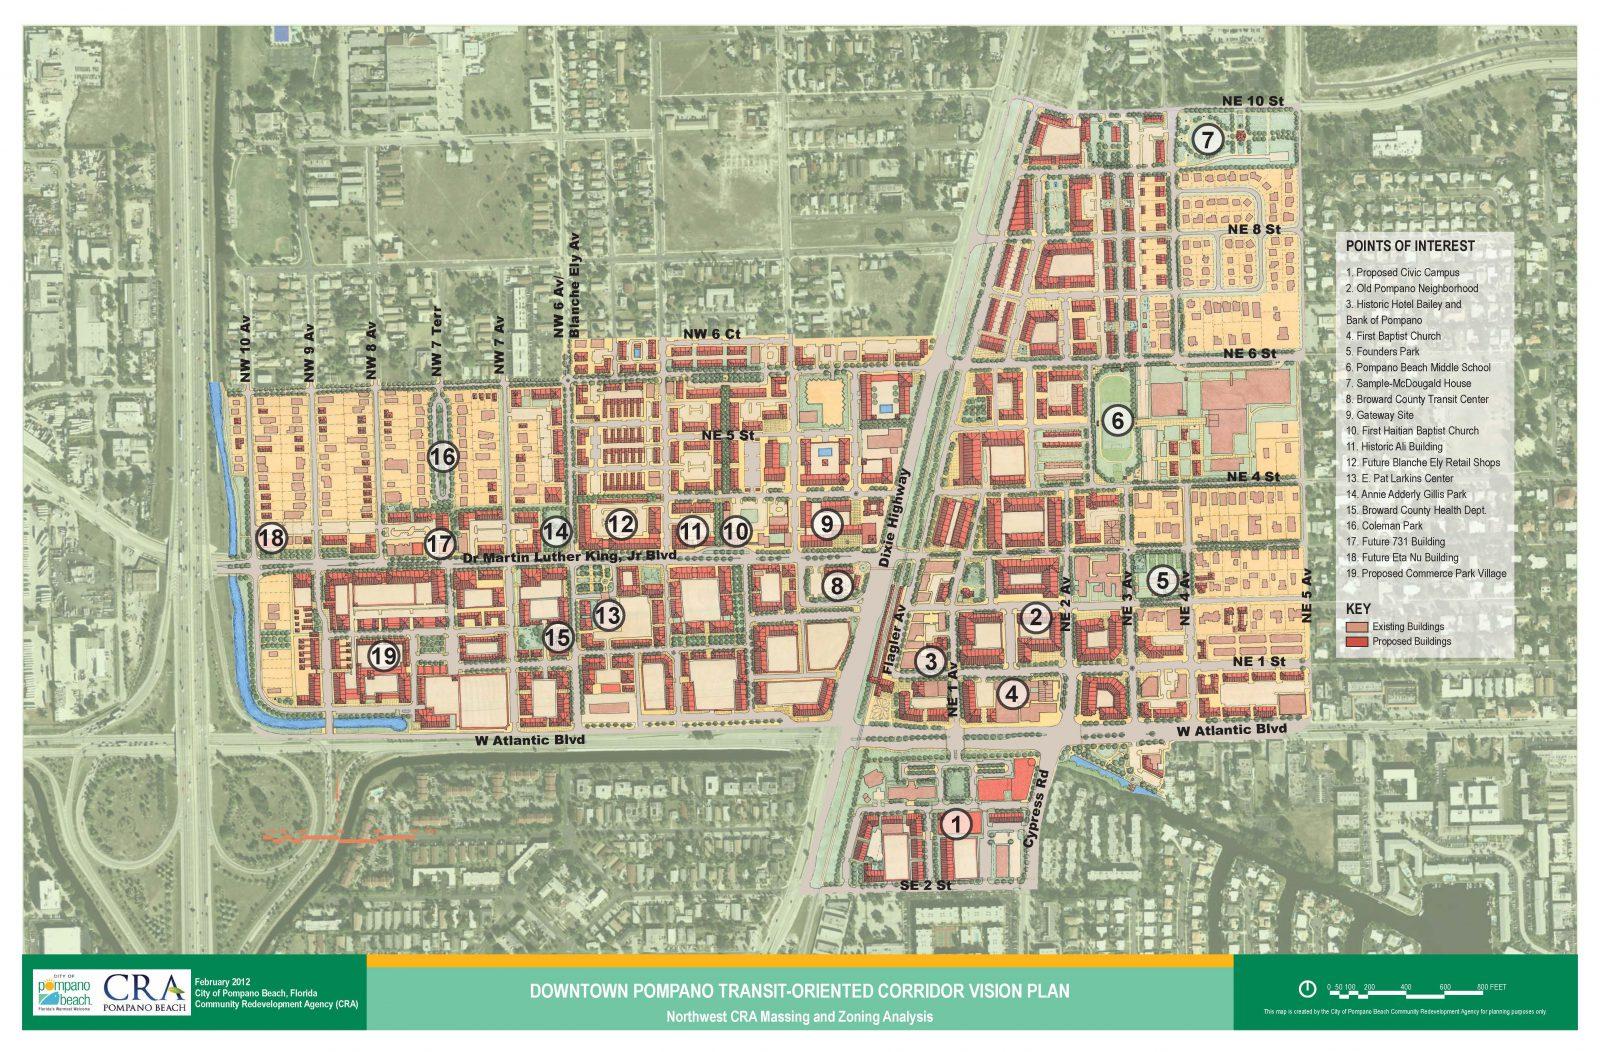 Pompano Beach Master Plan, Land Use Amendment & Zoning Regulations